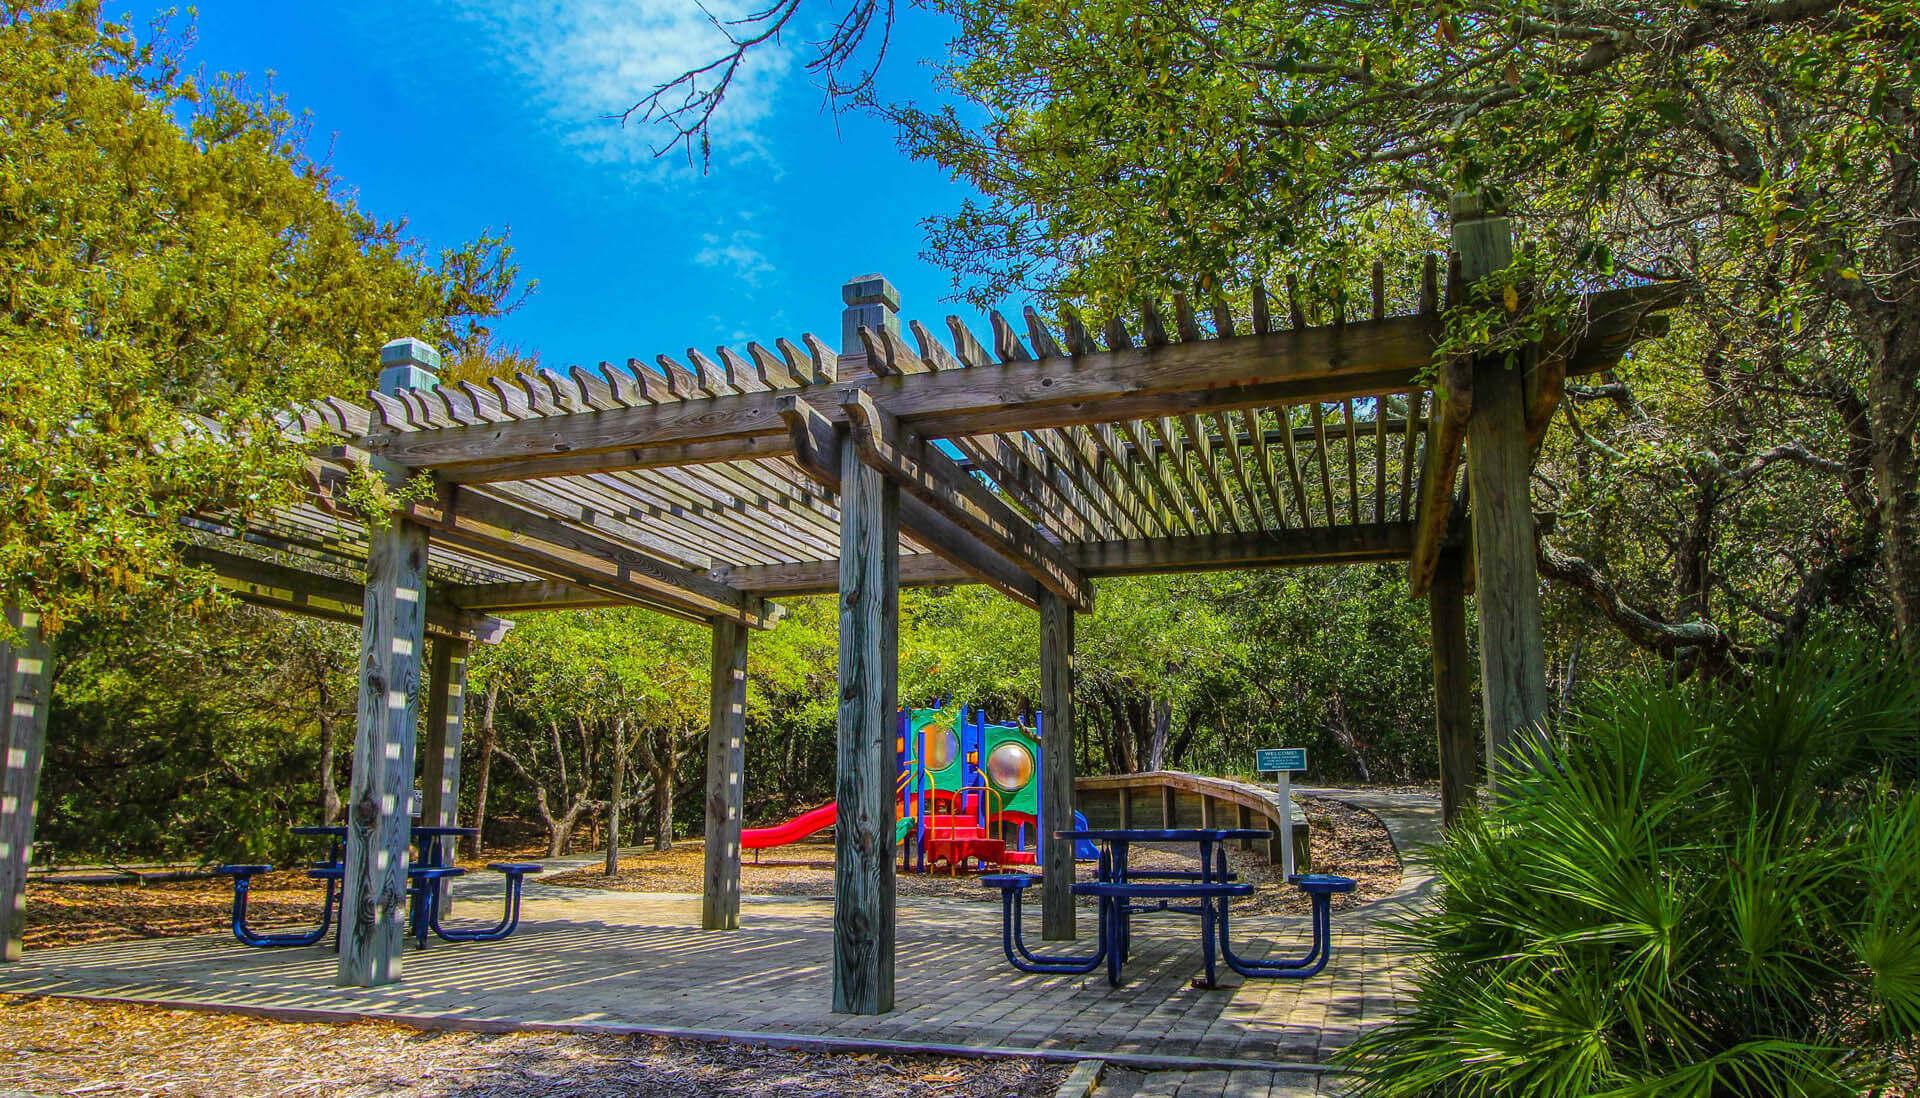 The Hammocks Bald Head Island Playground